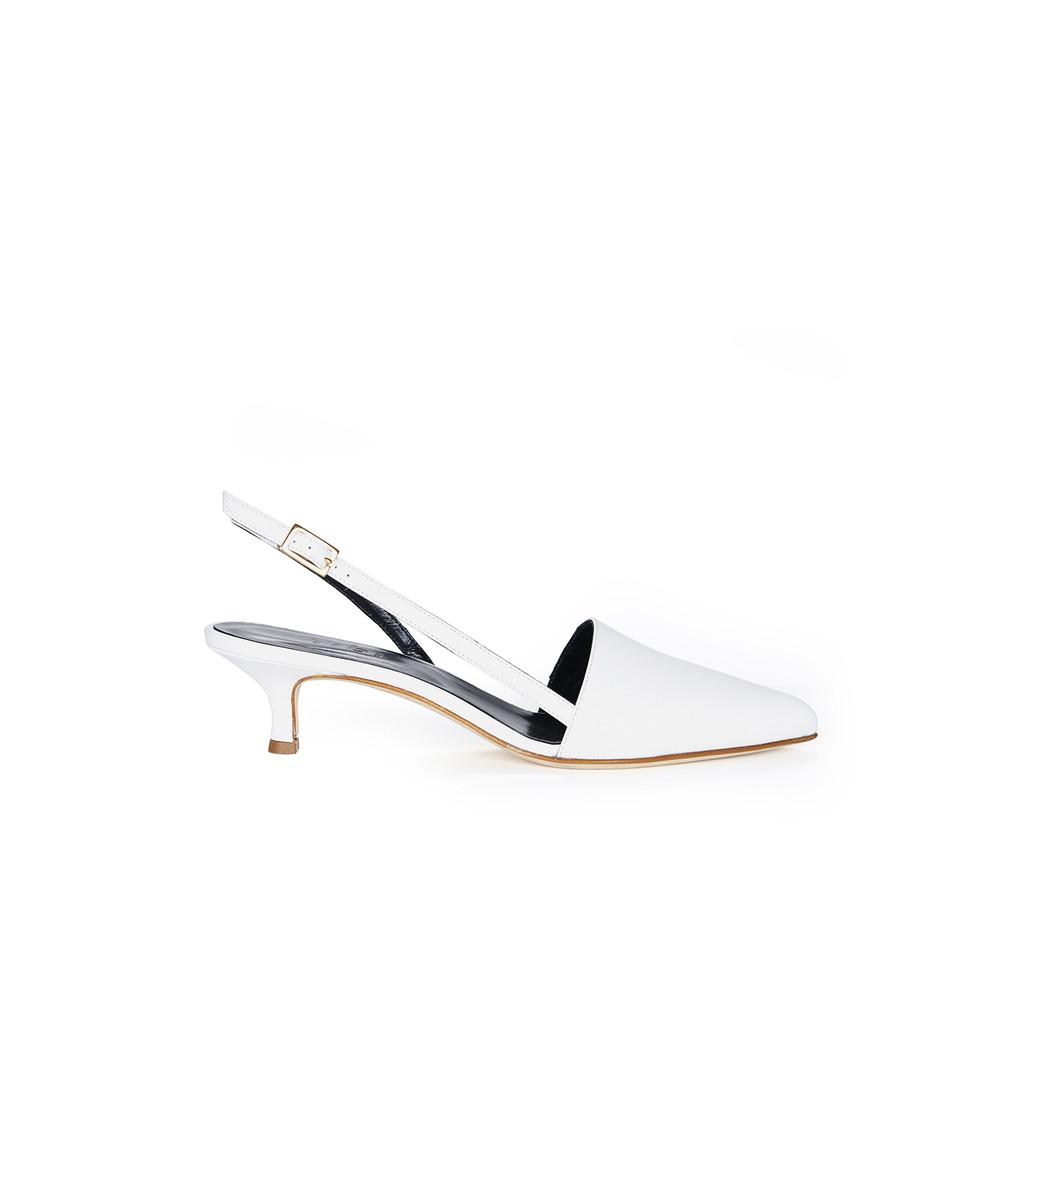 c6363f38db8 Tibi Simon Heels - White Calf Leather Heels